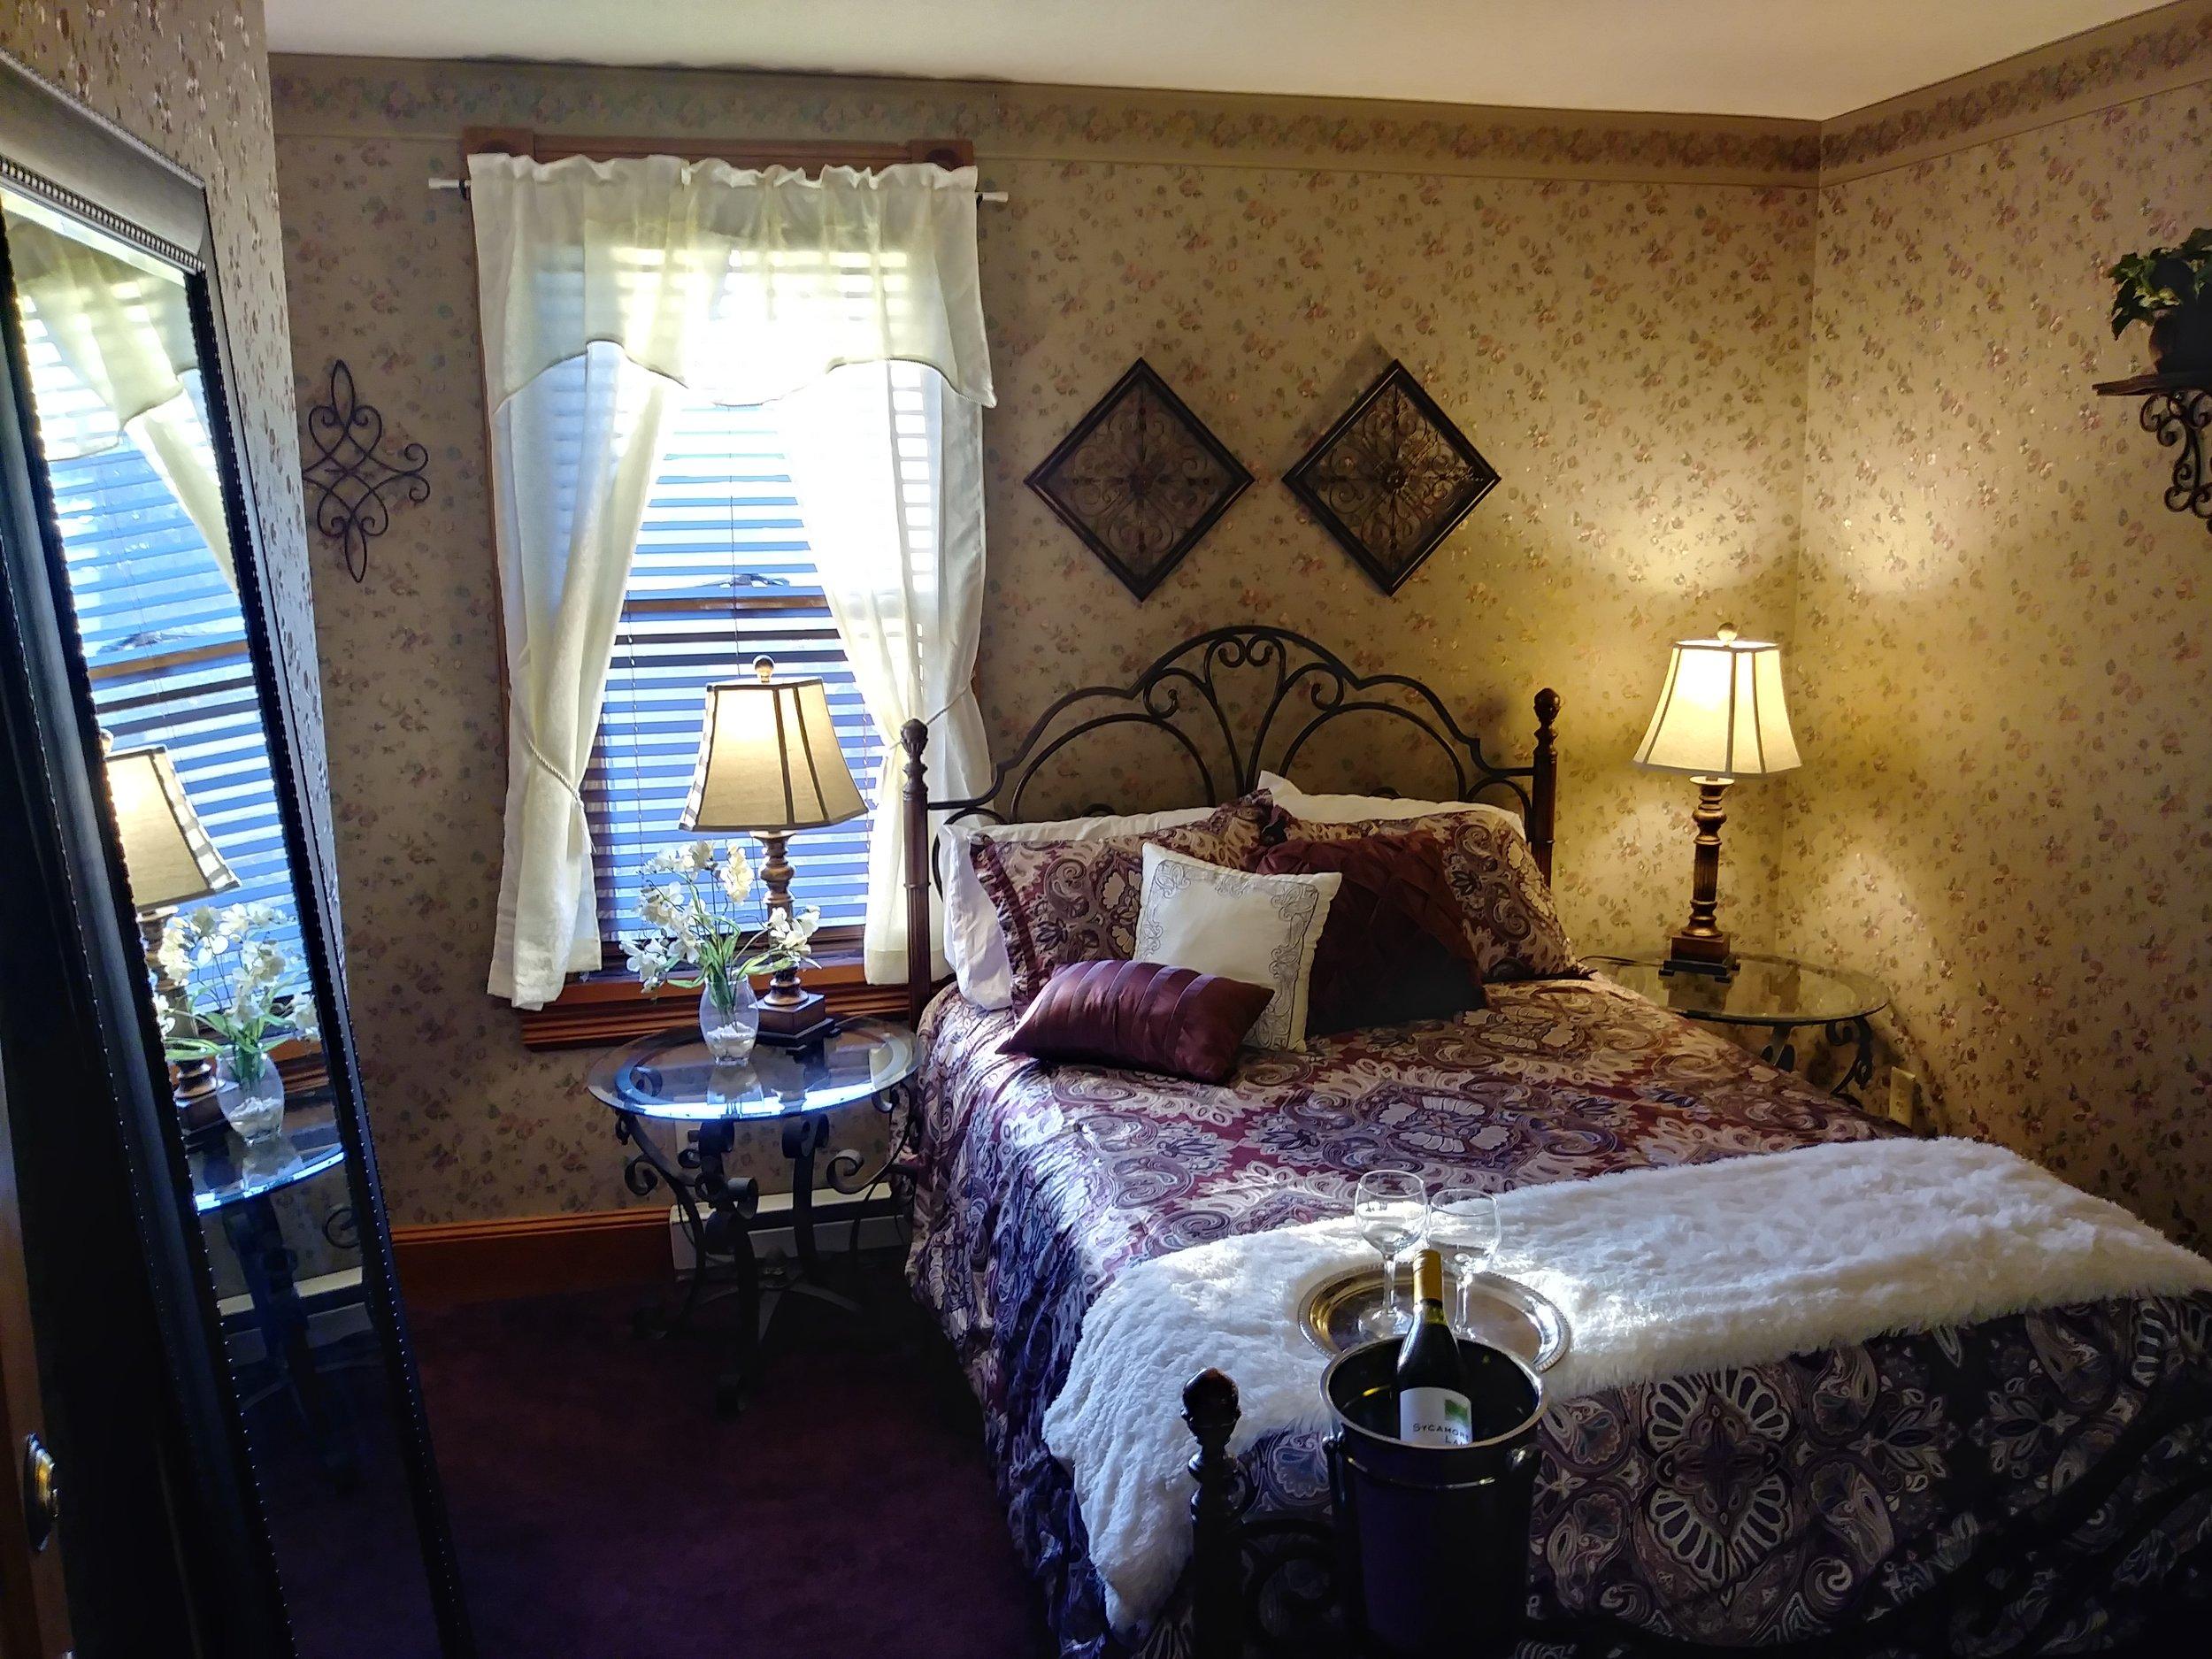 Room 306 08.jpg